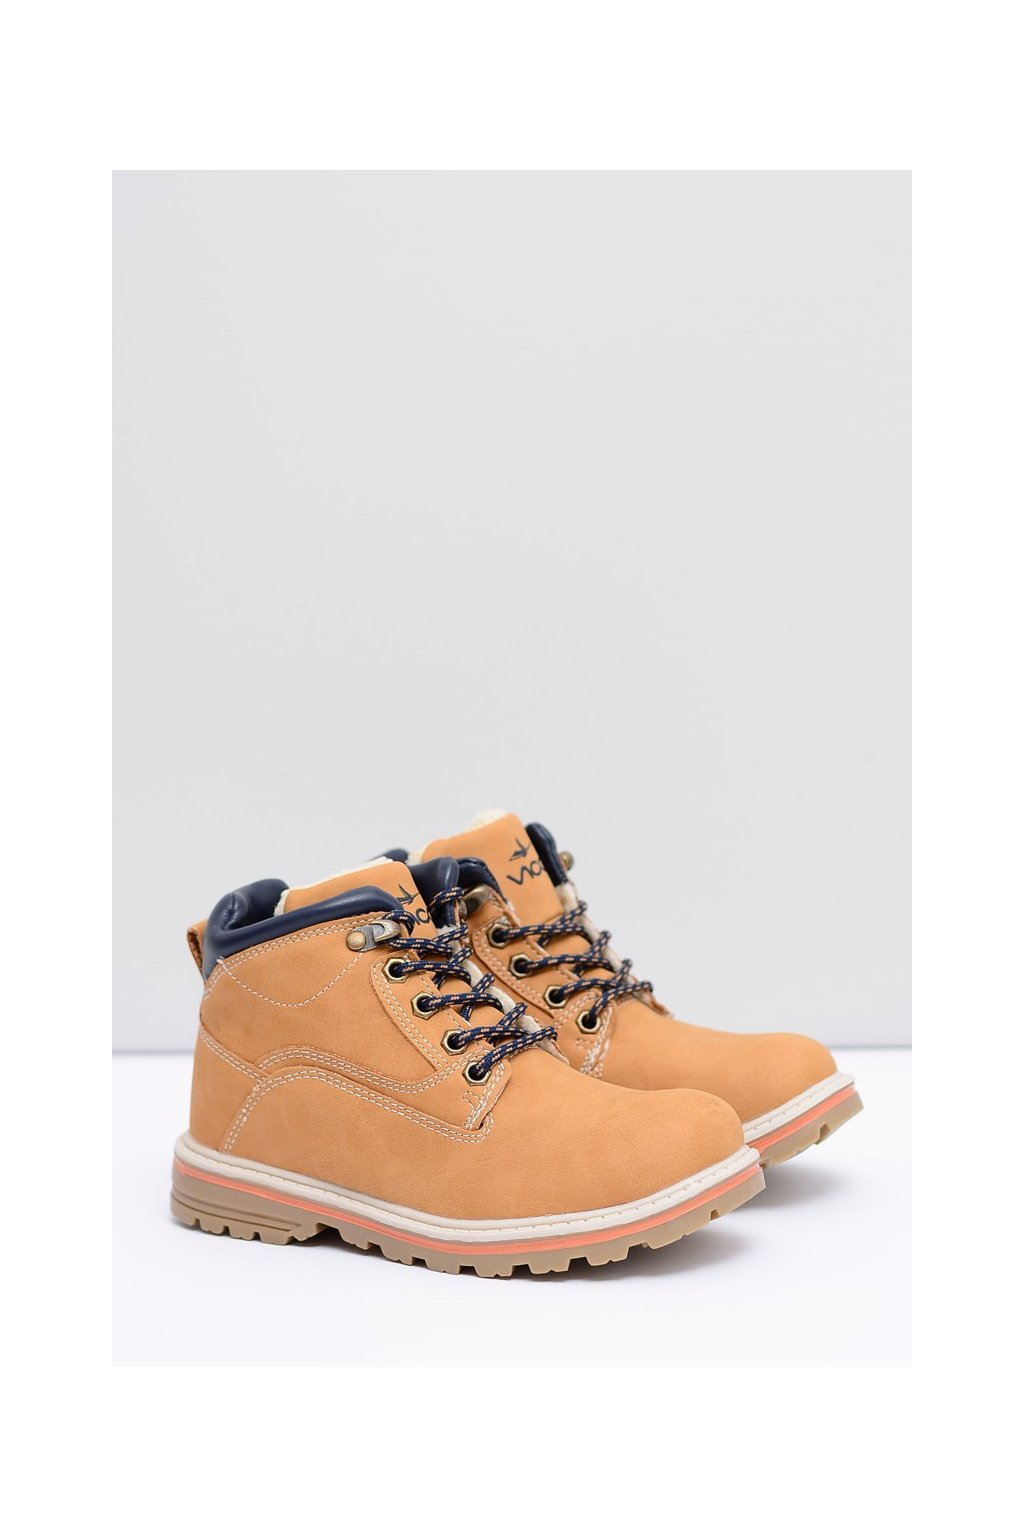 Detské členkové topánky farba hnedá kód obuvi VOP16D17-1 CAMEL